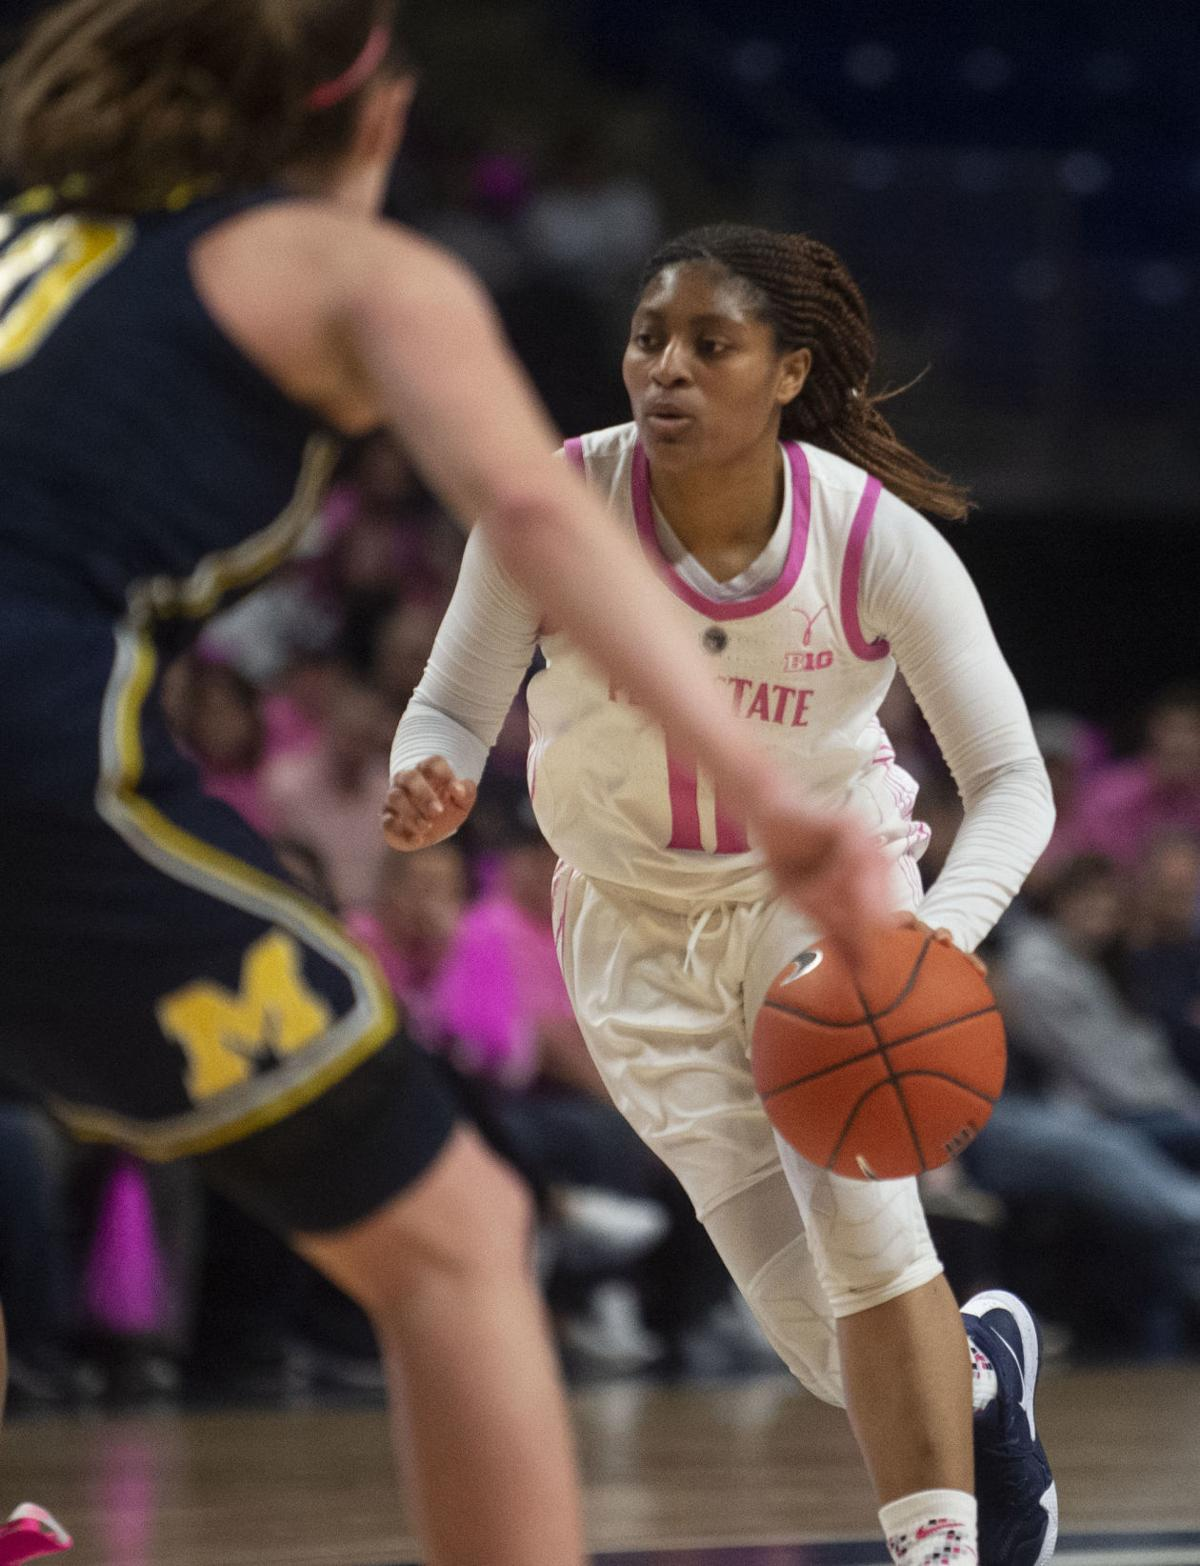 PHOTOS: 2019 Pink Zone Game, Penn State Women's Basketball